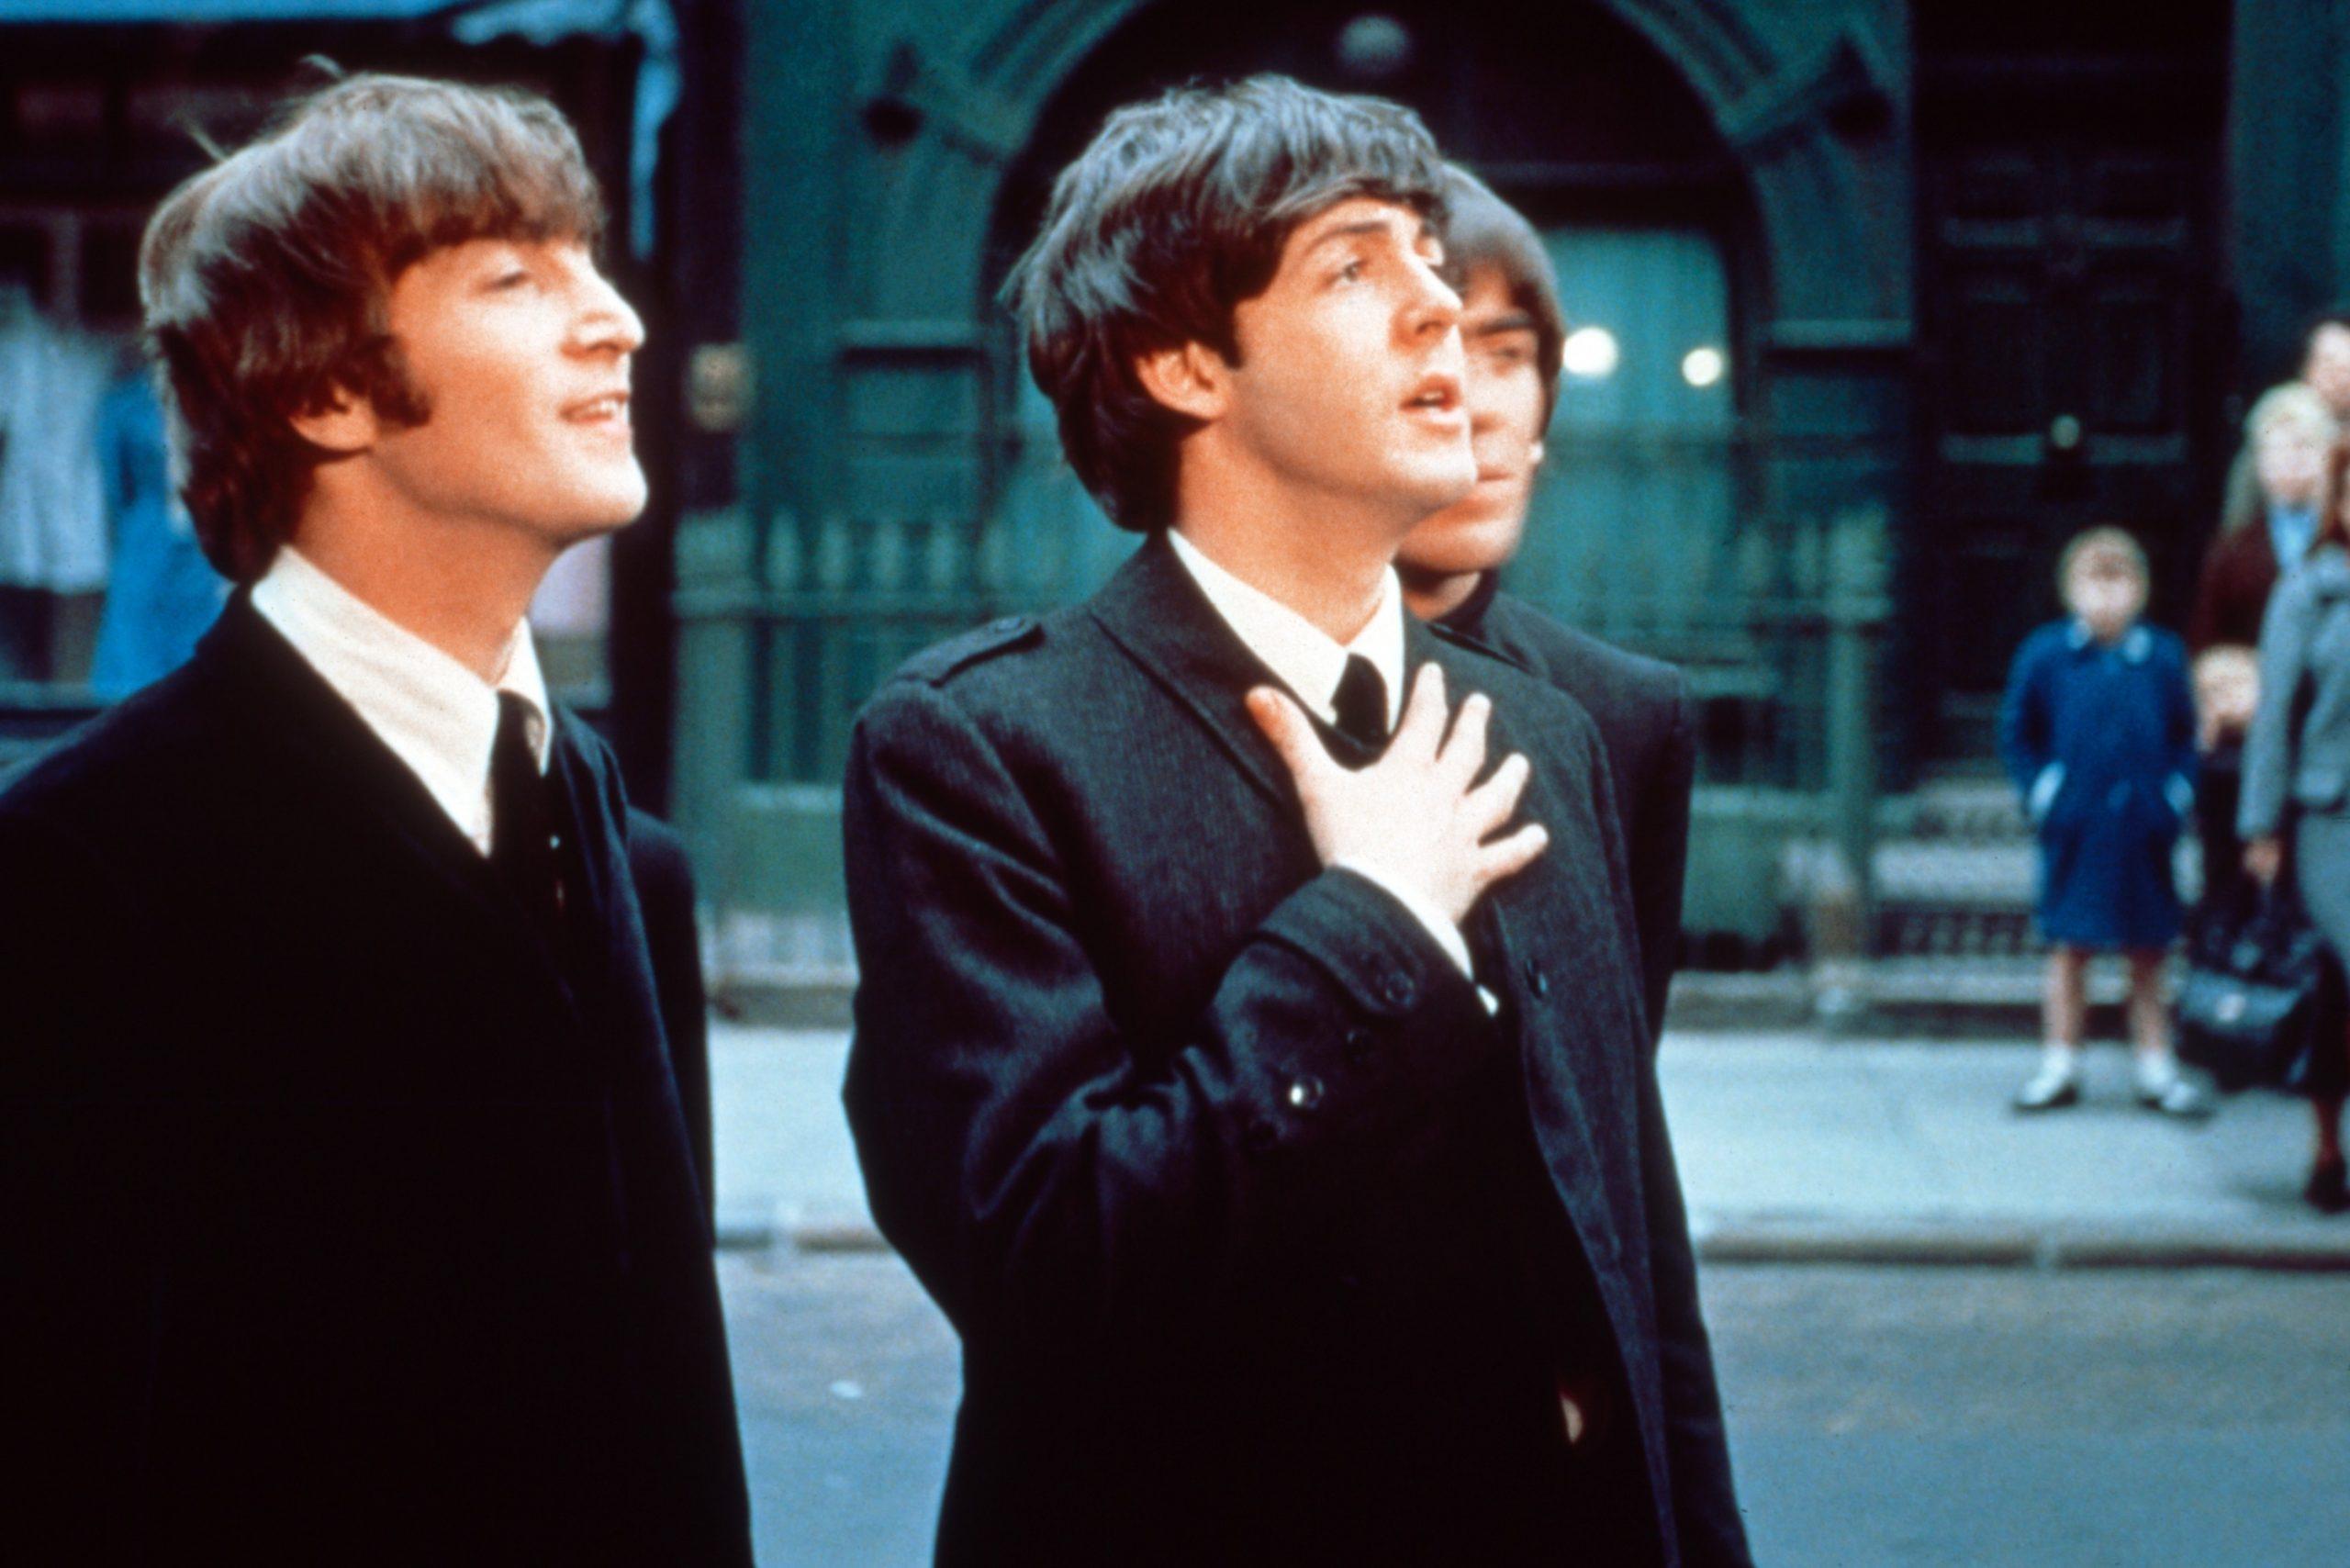 John Lennon and Paul McCartney for A Hard Day's Night